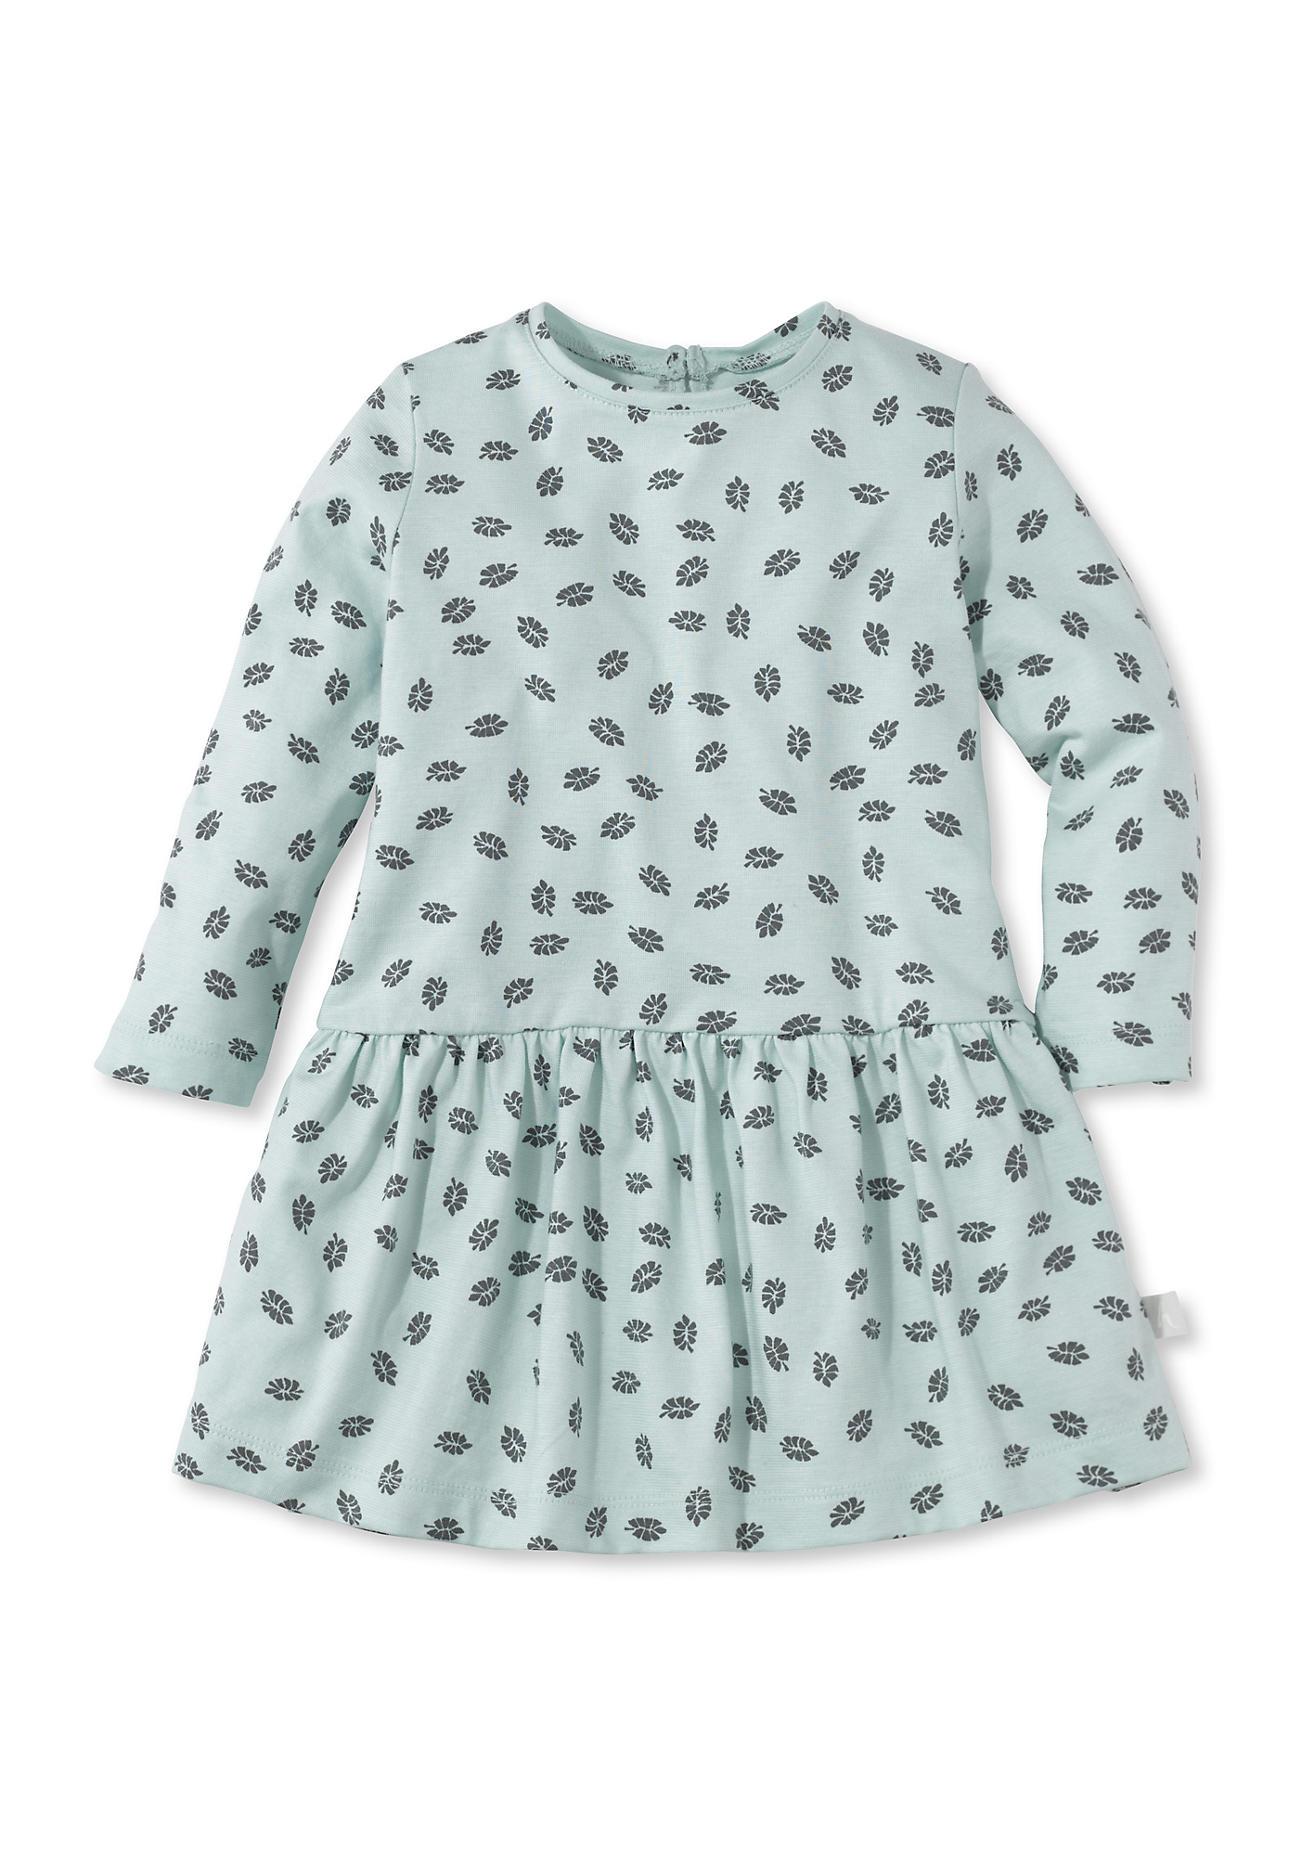 hessnatur baby kleid aus bio baumwolle blau gr e 74 80 kinder babys kleider. Black Bedroom Furniture Sets. Home Design Ideas